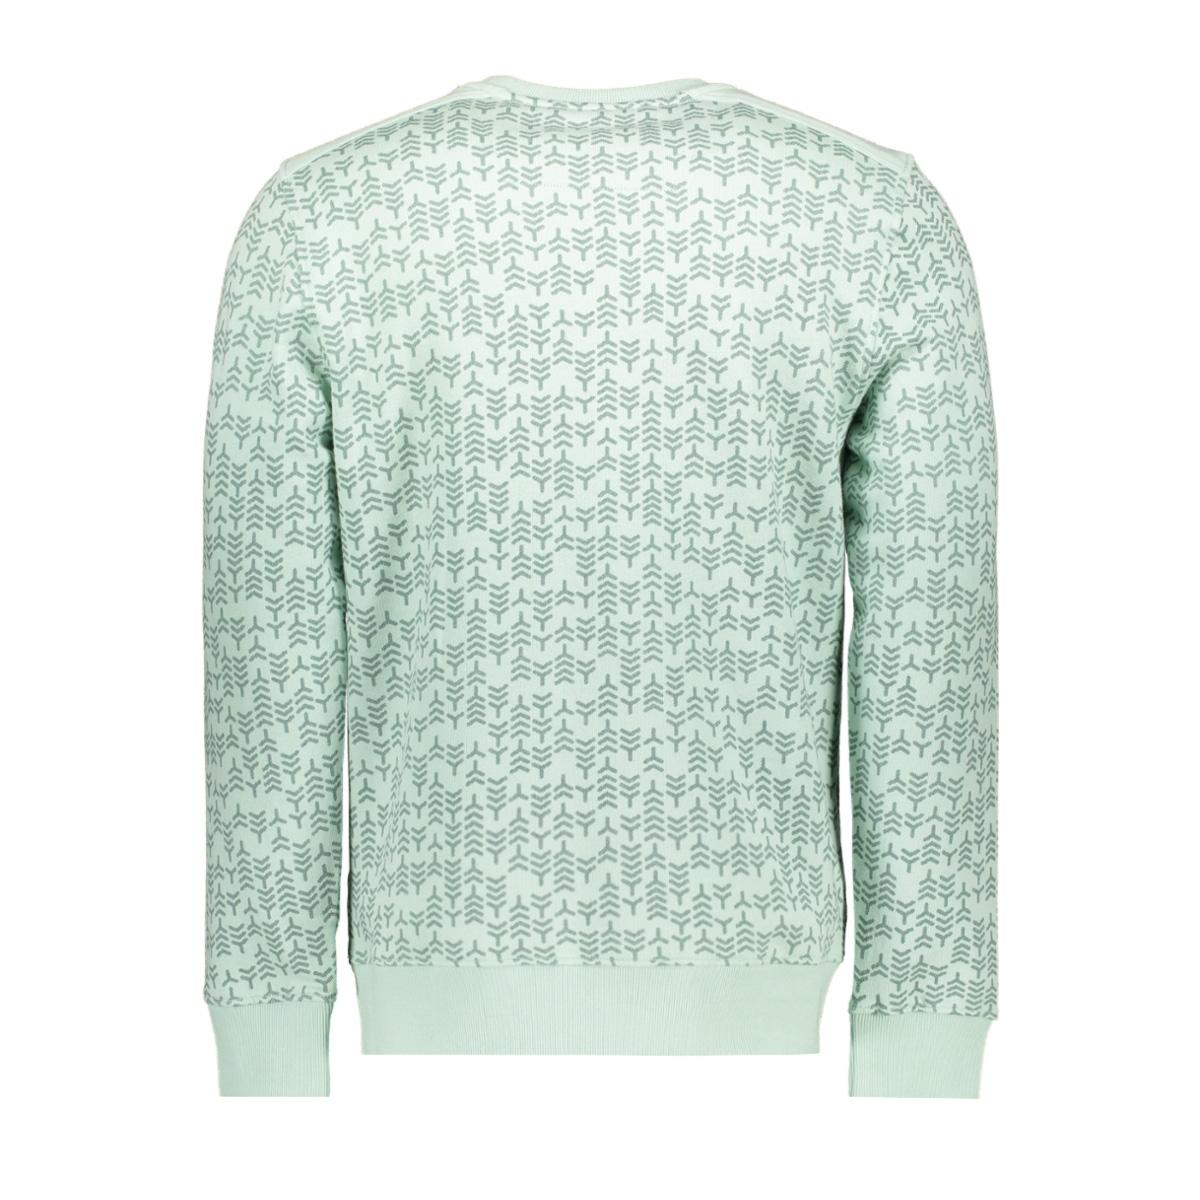 psw191410 pme legend sweater 6174